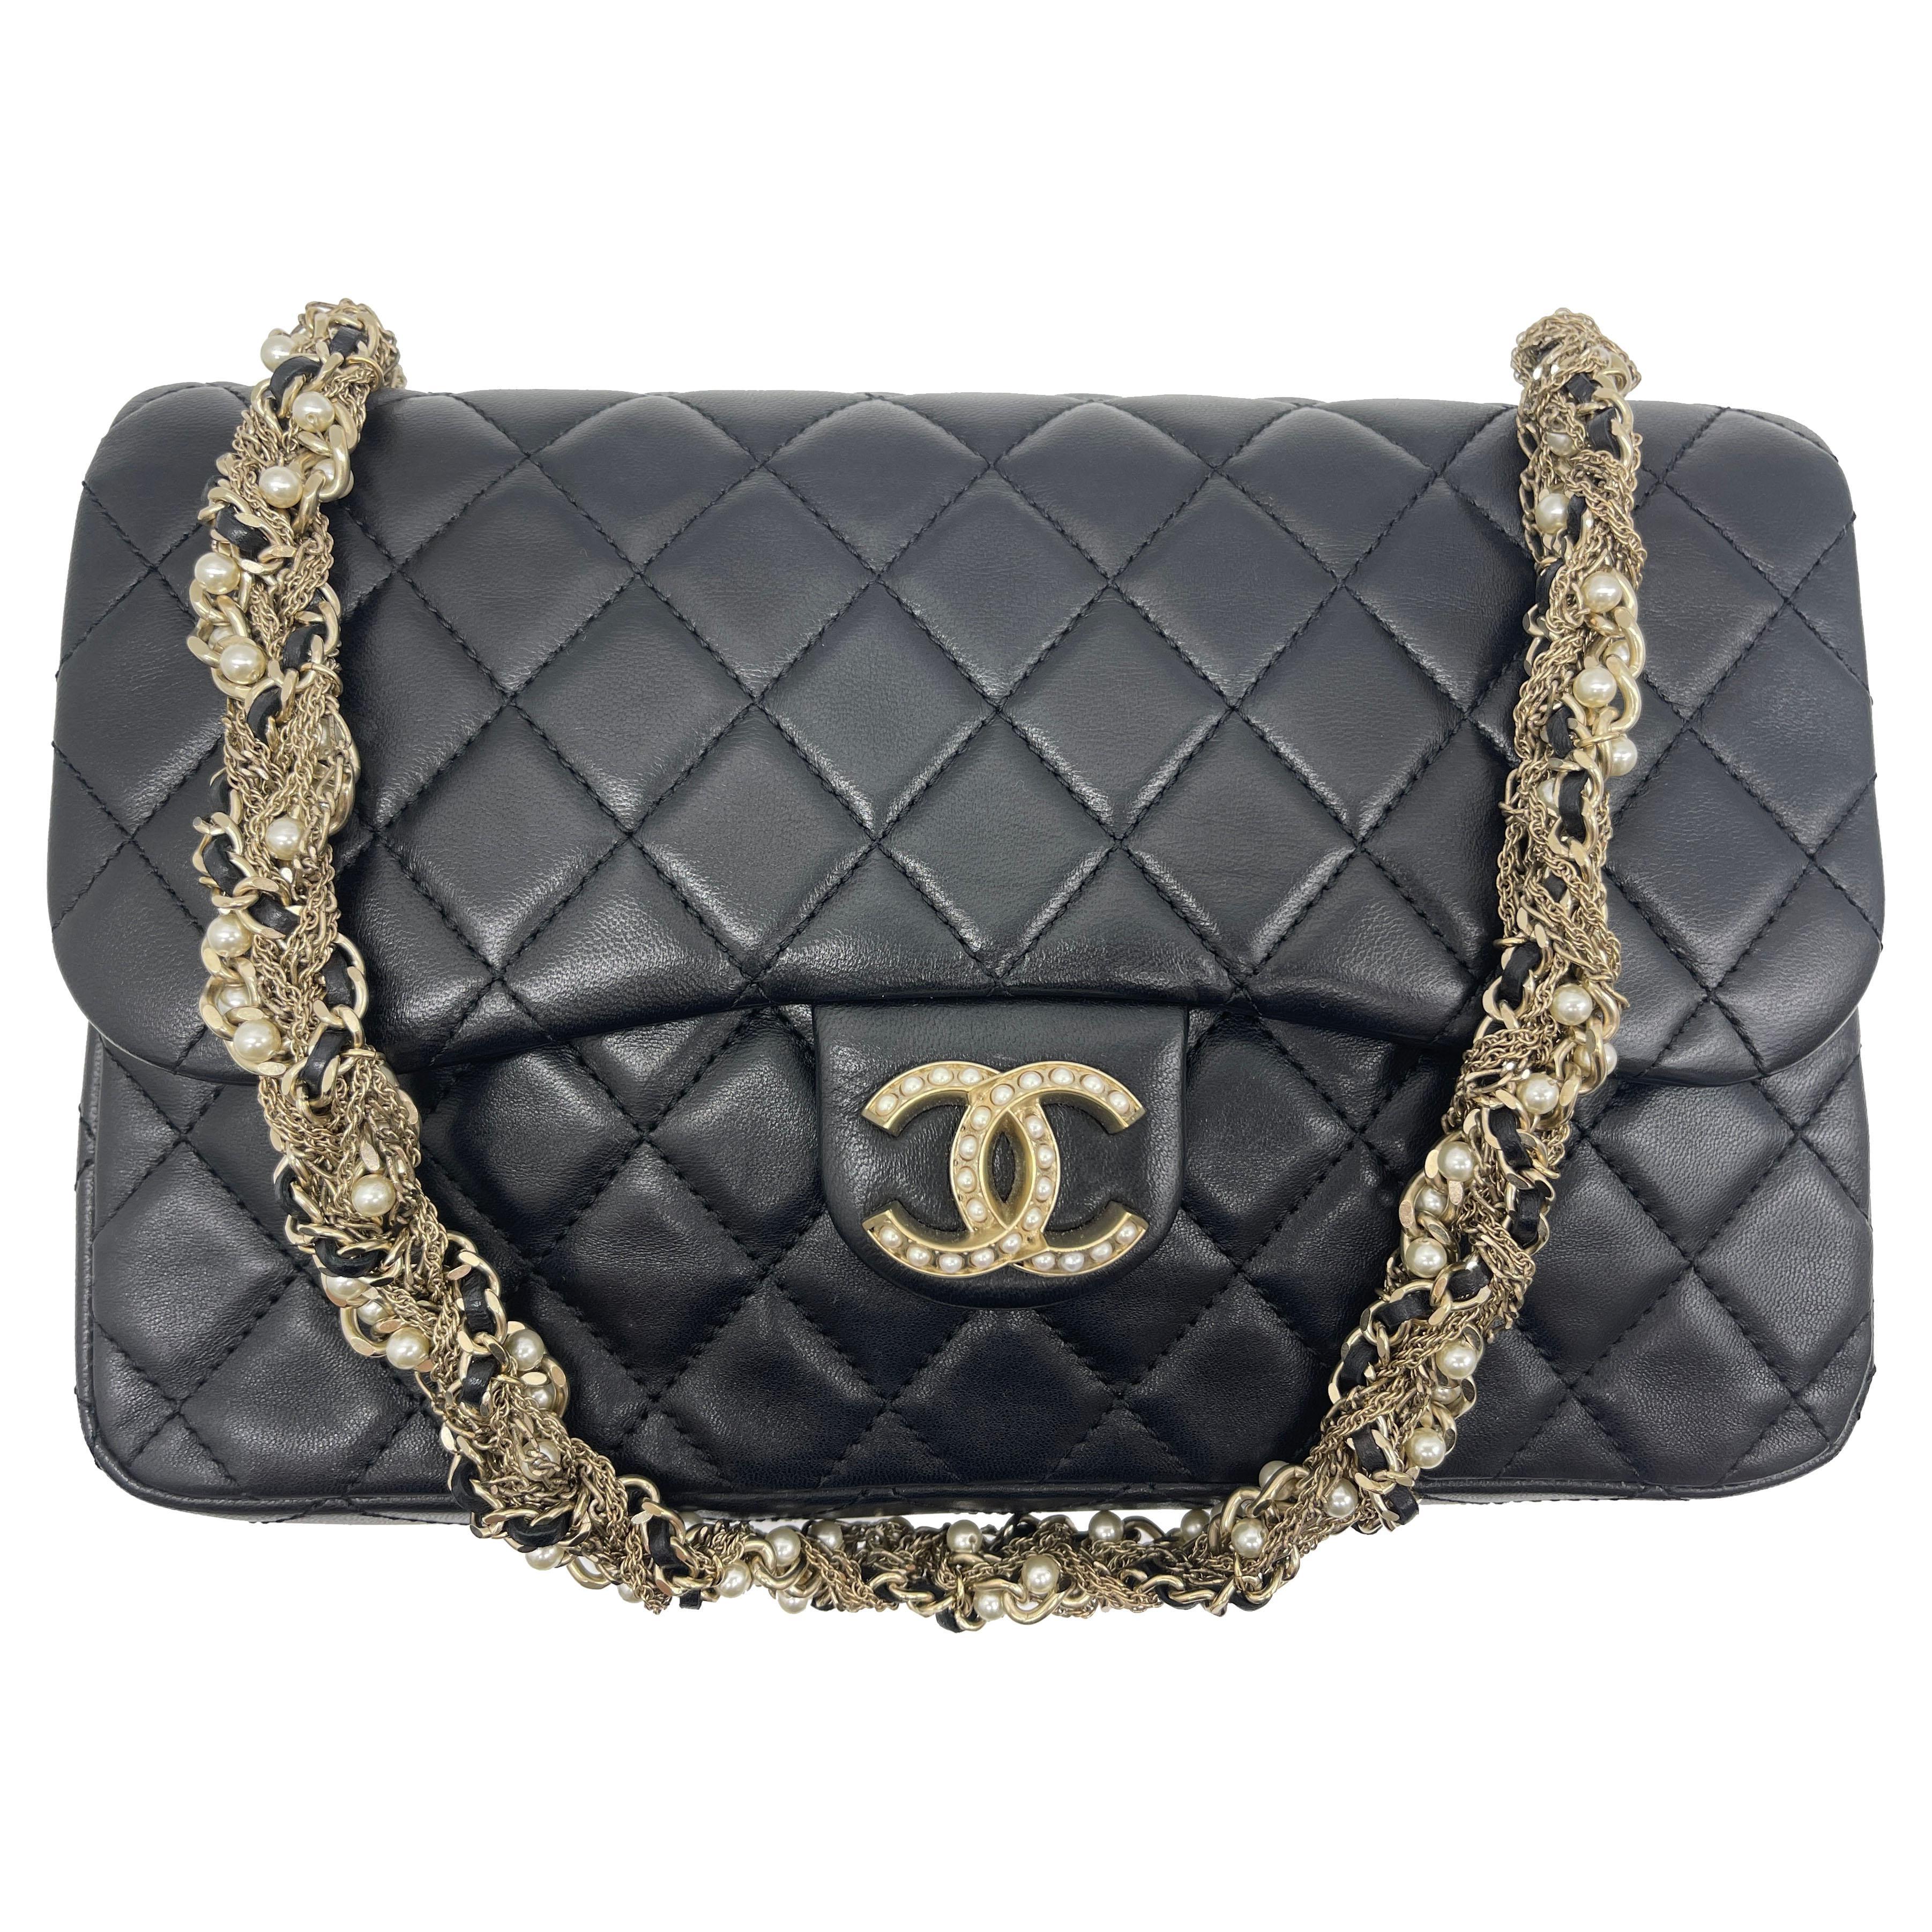 WOMENS DESIGNER Chanel black quilted lambskin medium westminster pearl flap bag